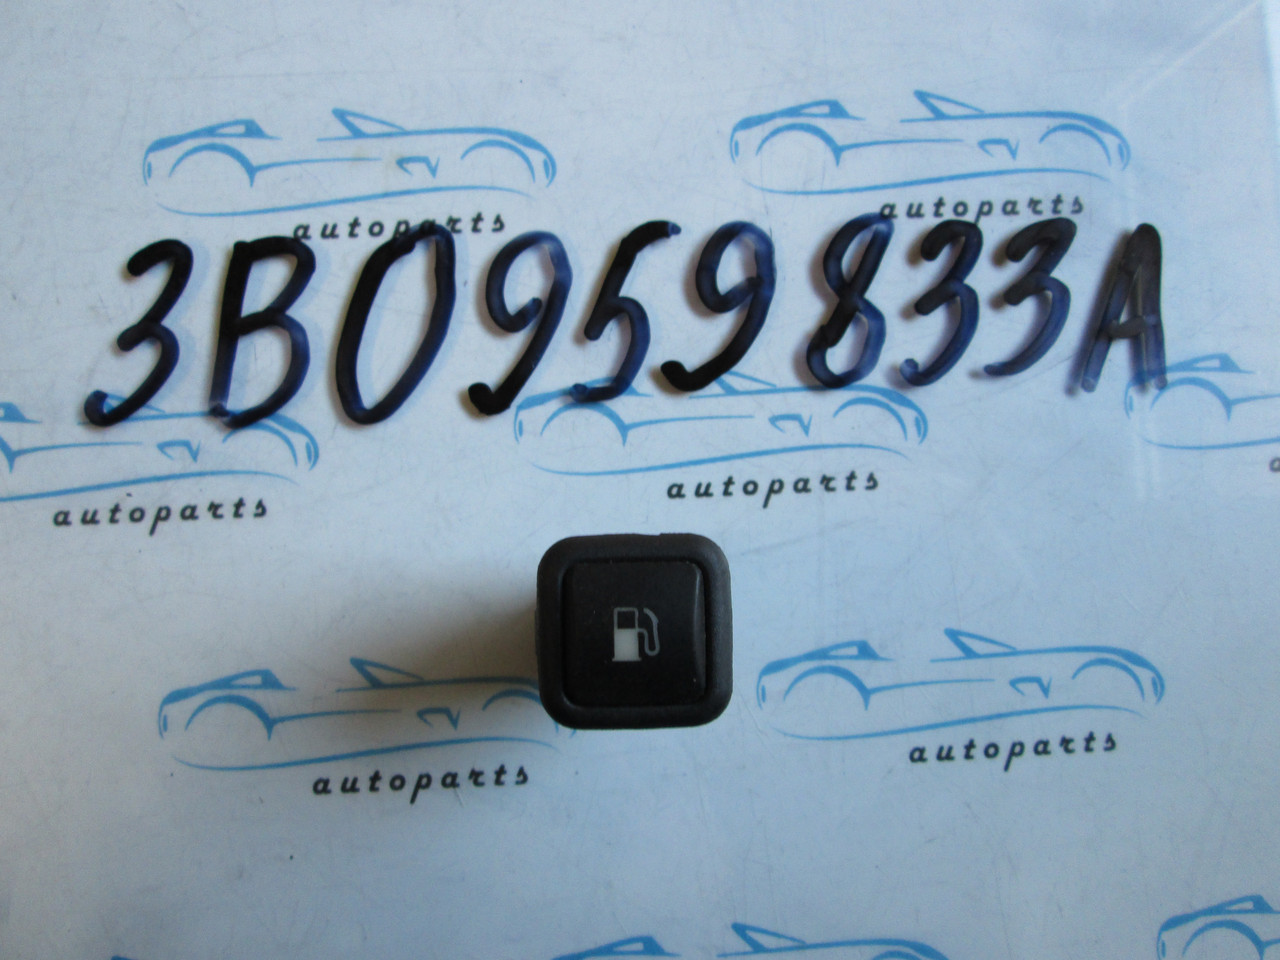 Кнопка лючка бензобака Golf 4, Гольф 4 3B0959833A